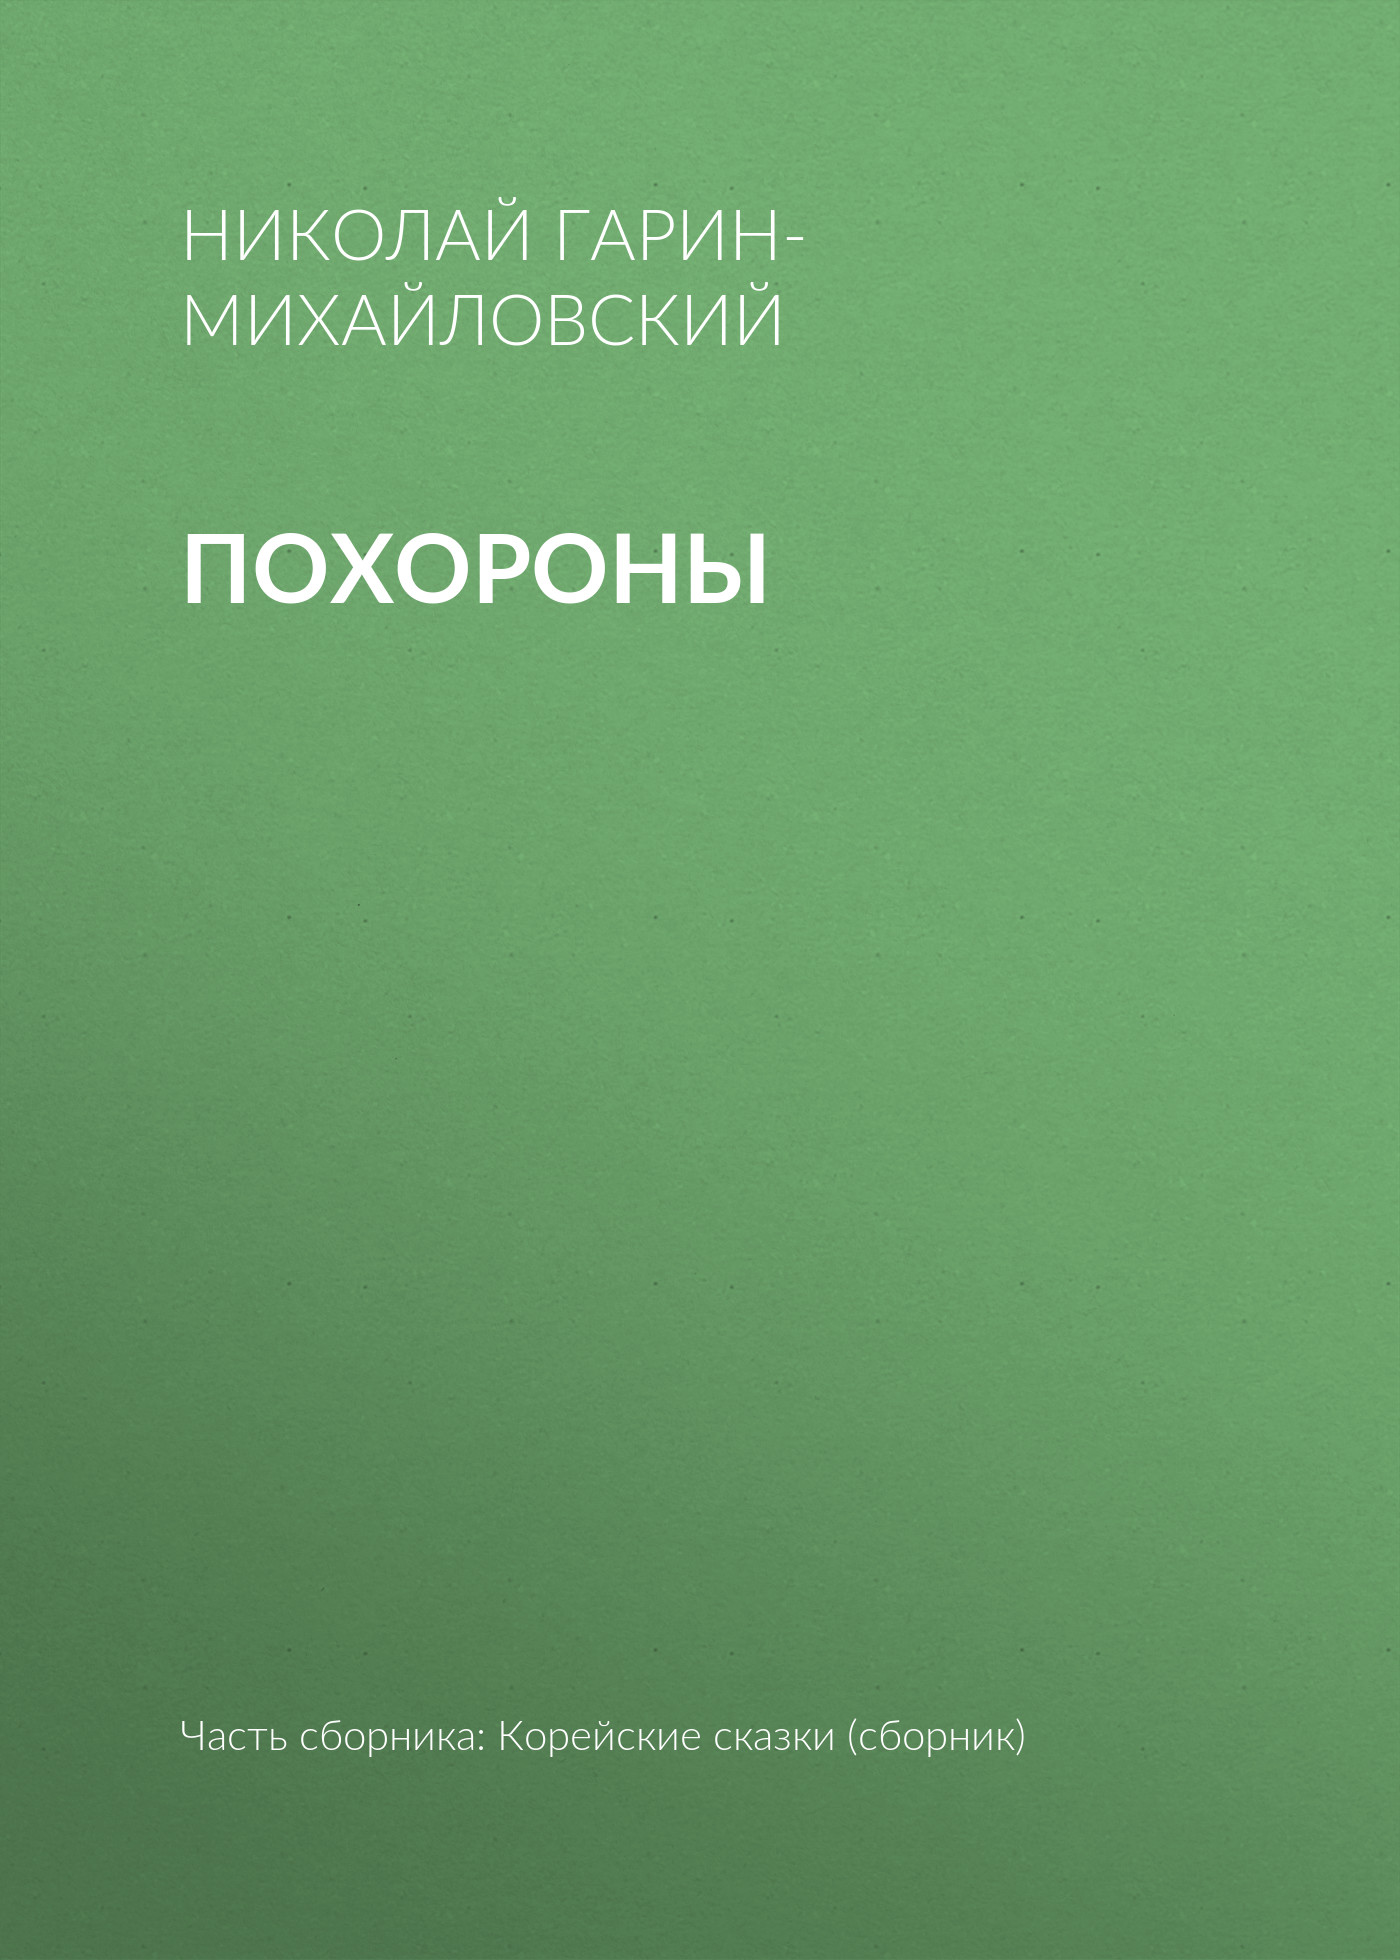 Николай Гарин-Михайловский Похороны цена